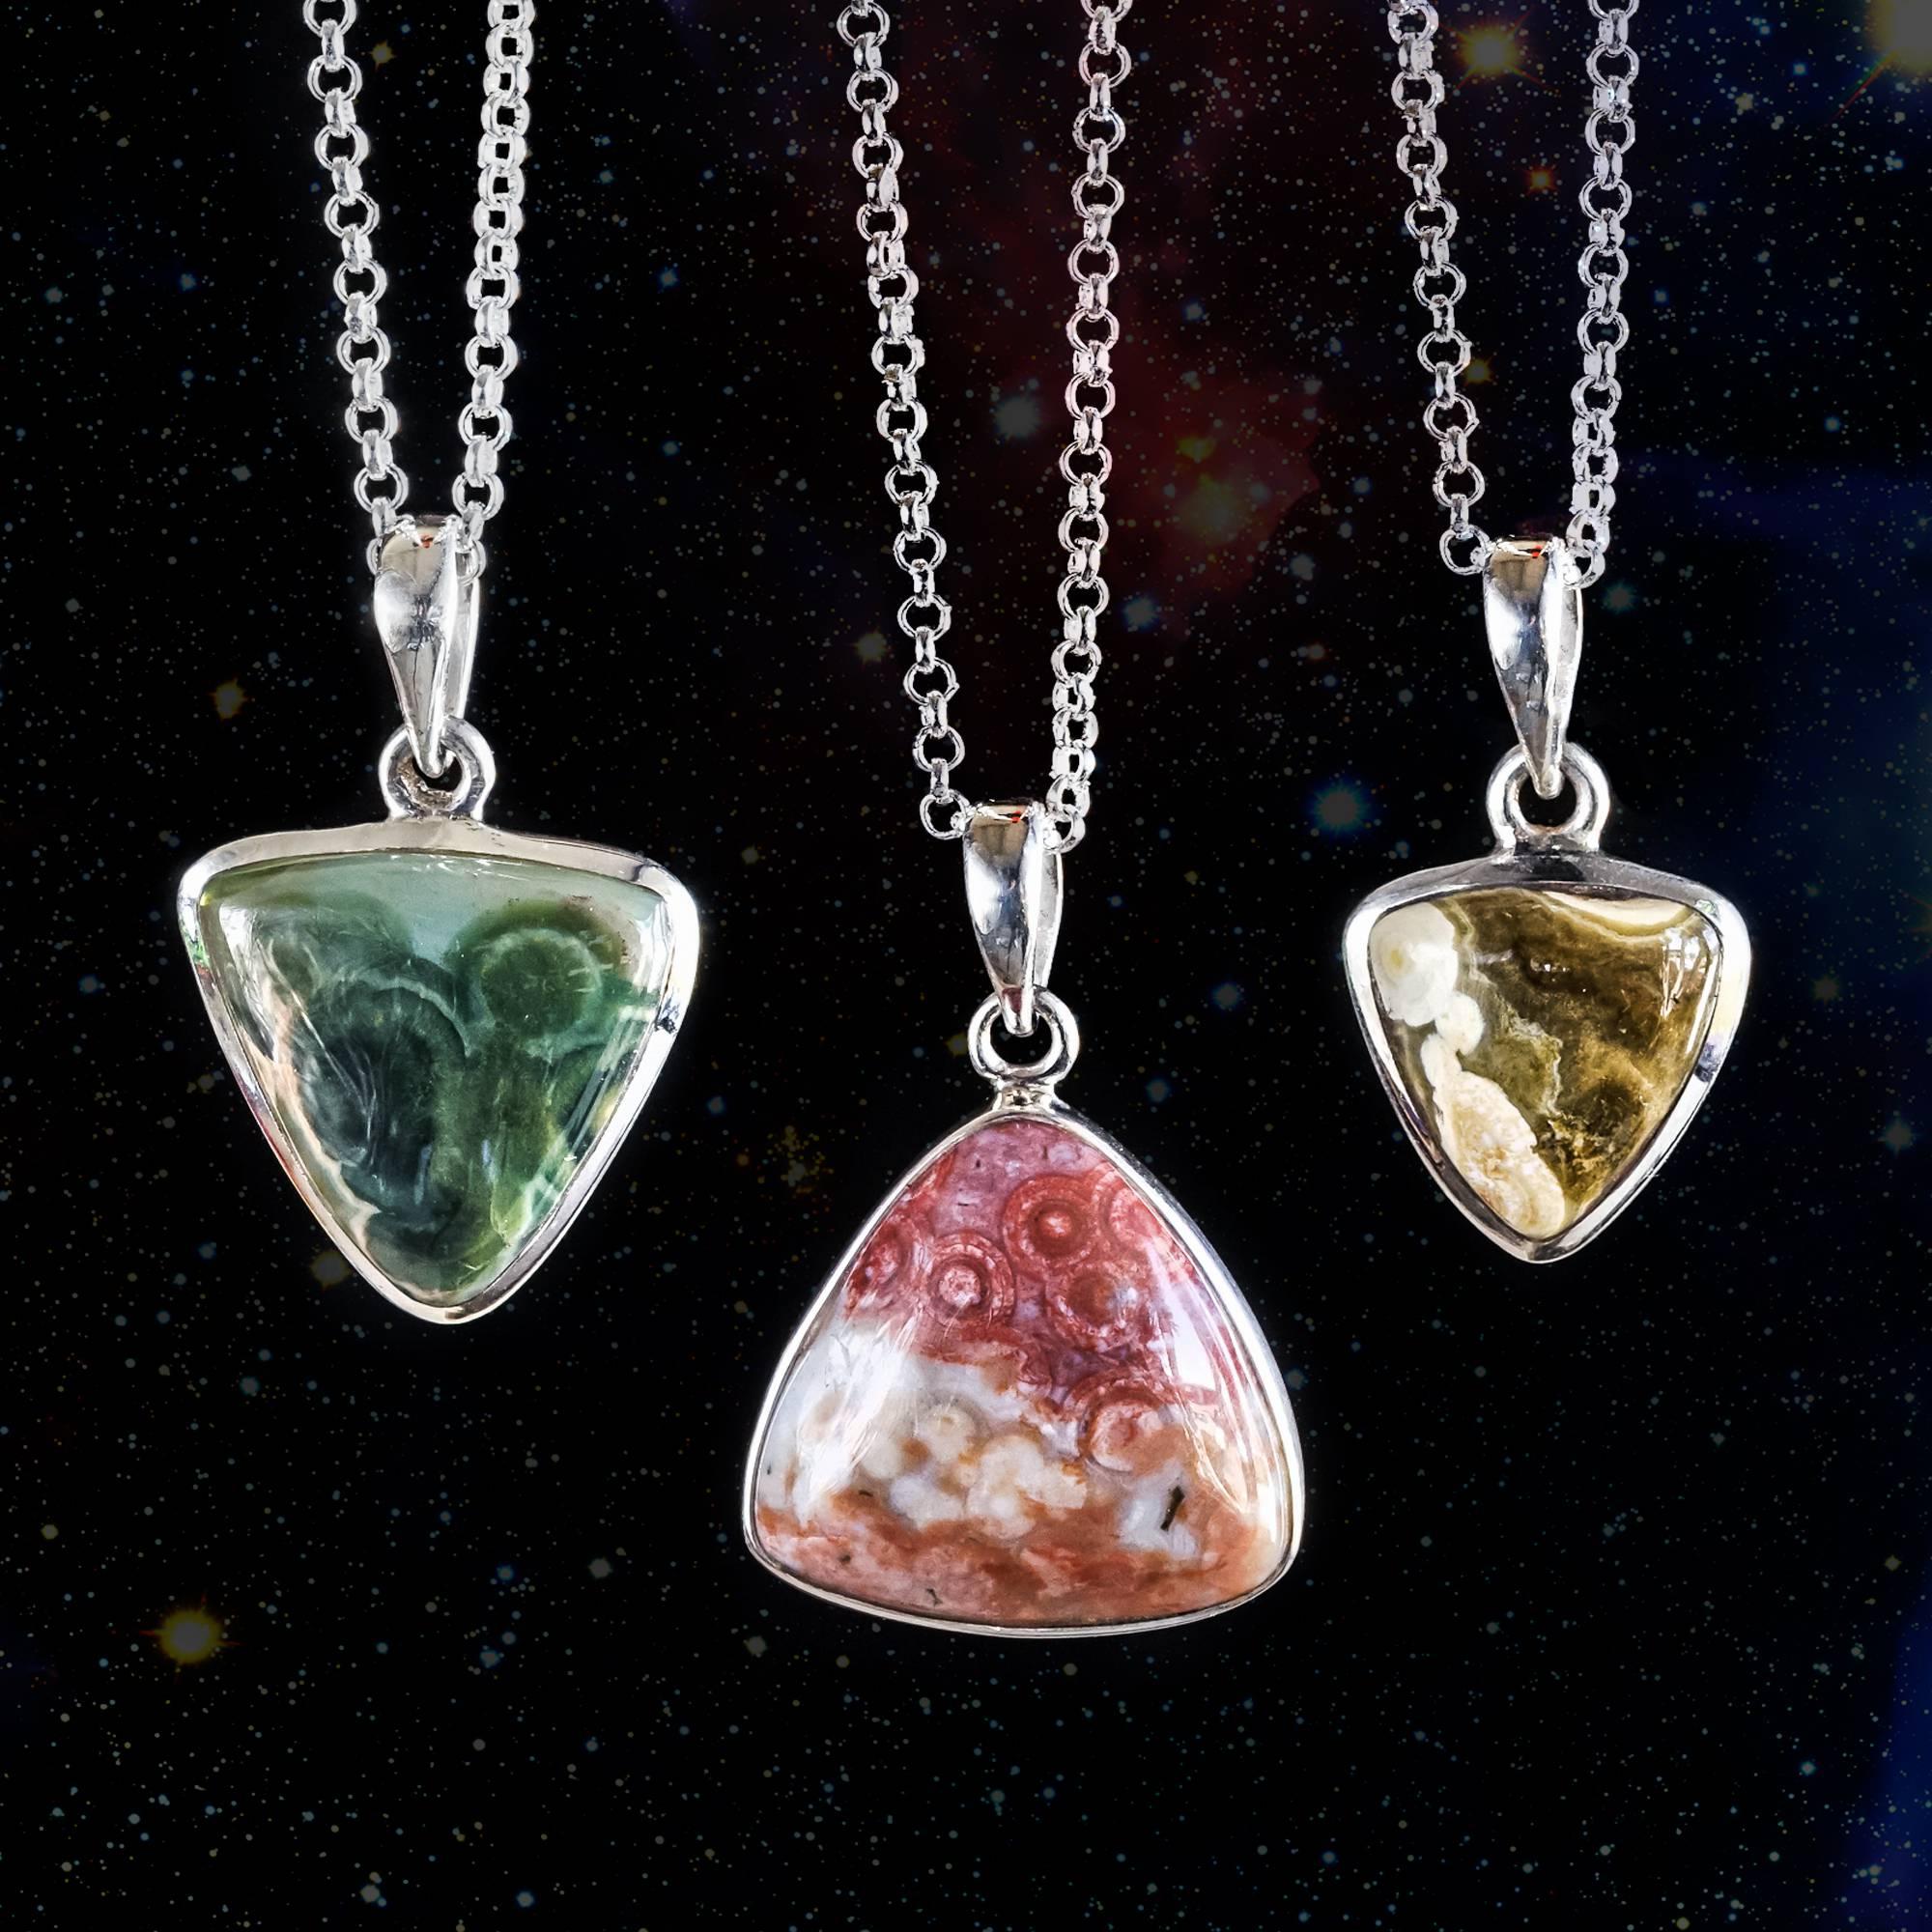 Ocean jasper pendants for attracting love and happiness ocean jasper pendants aloadofball Images